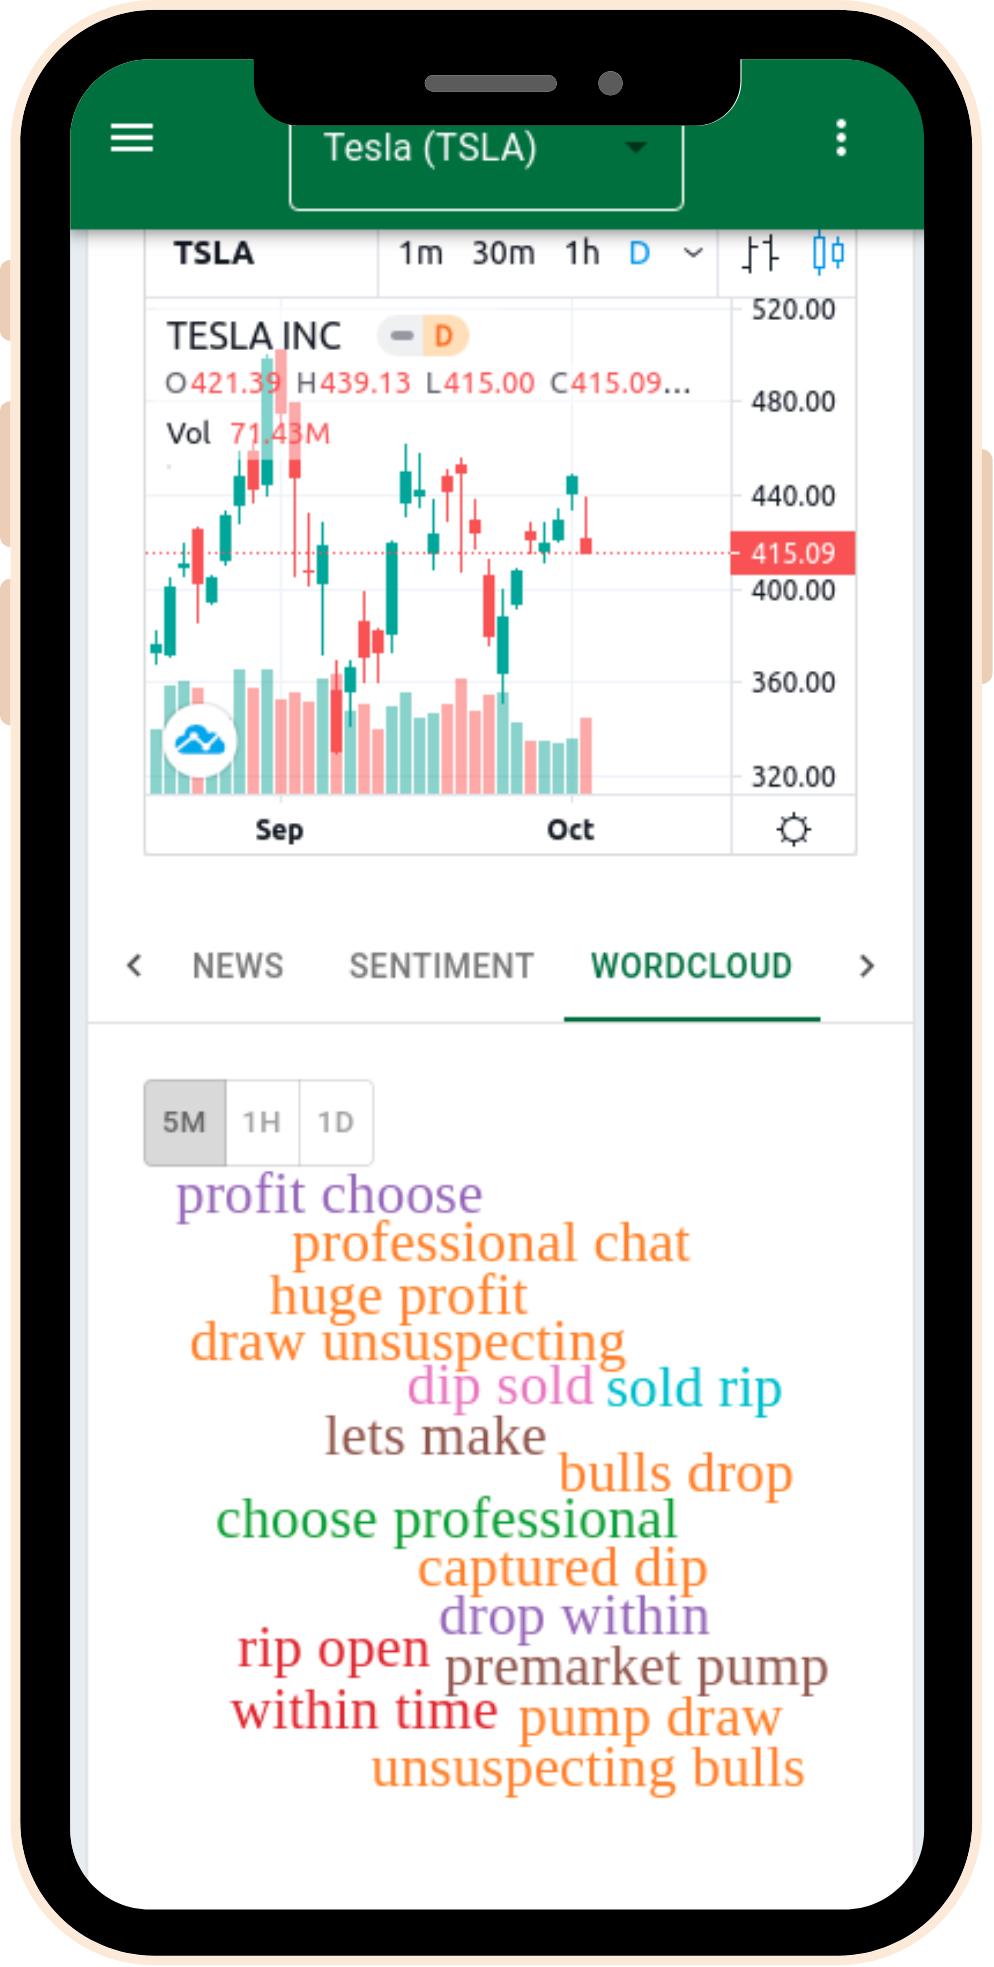 View the stock sentiment word cloud using the StockGeist platform